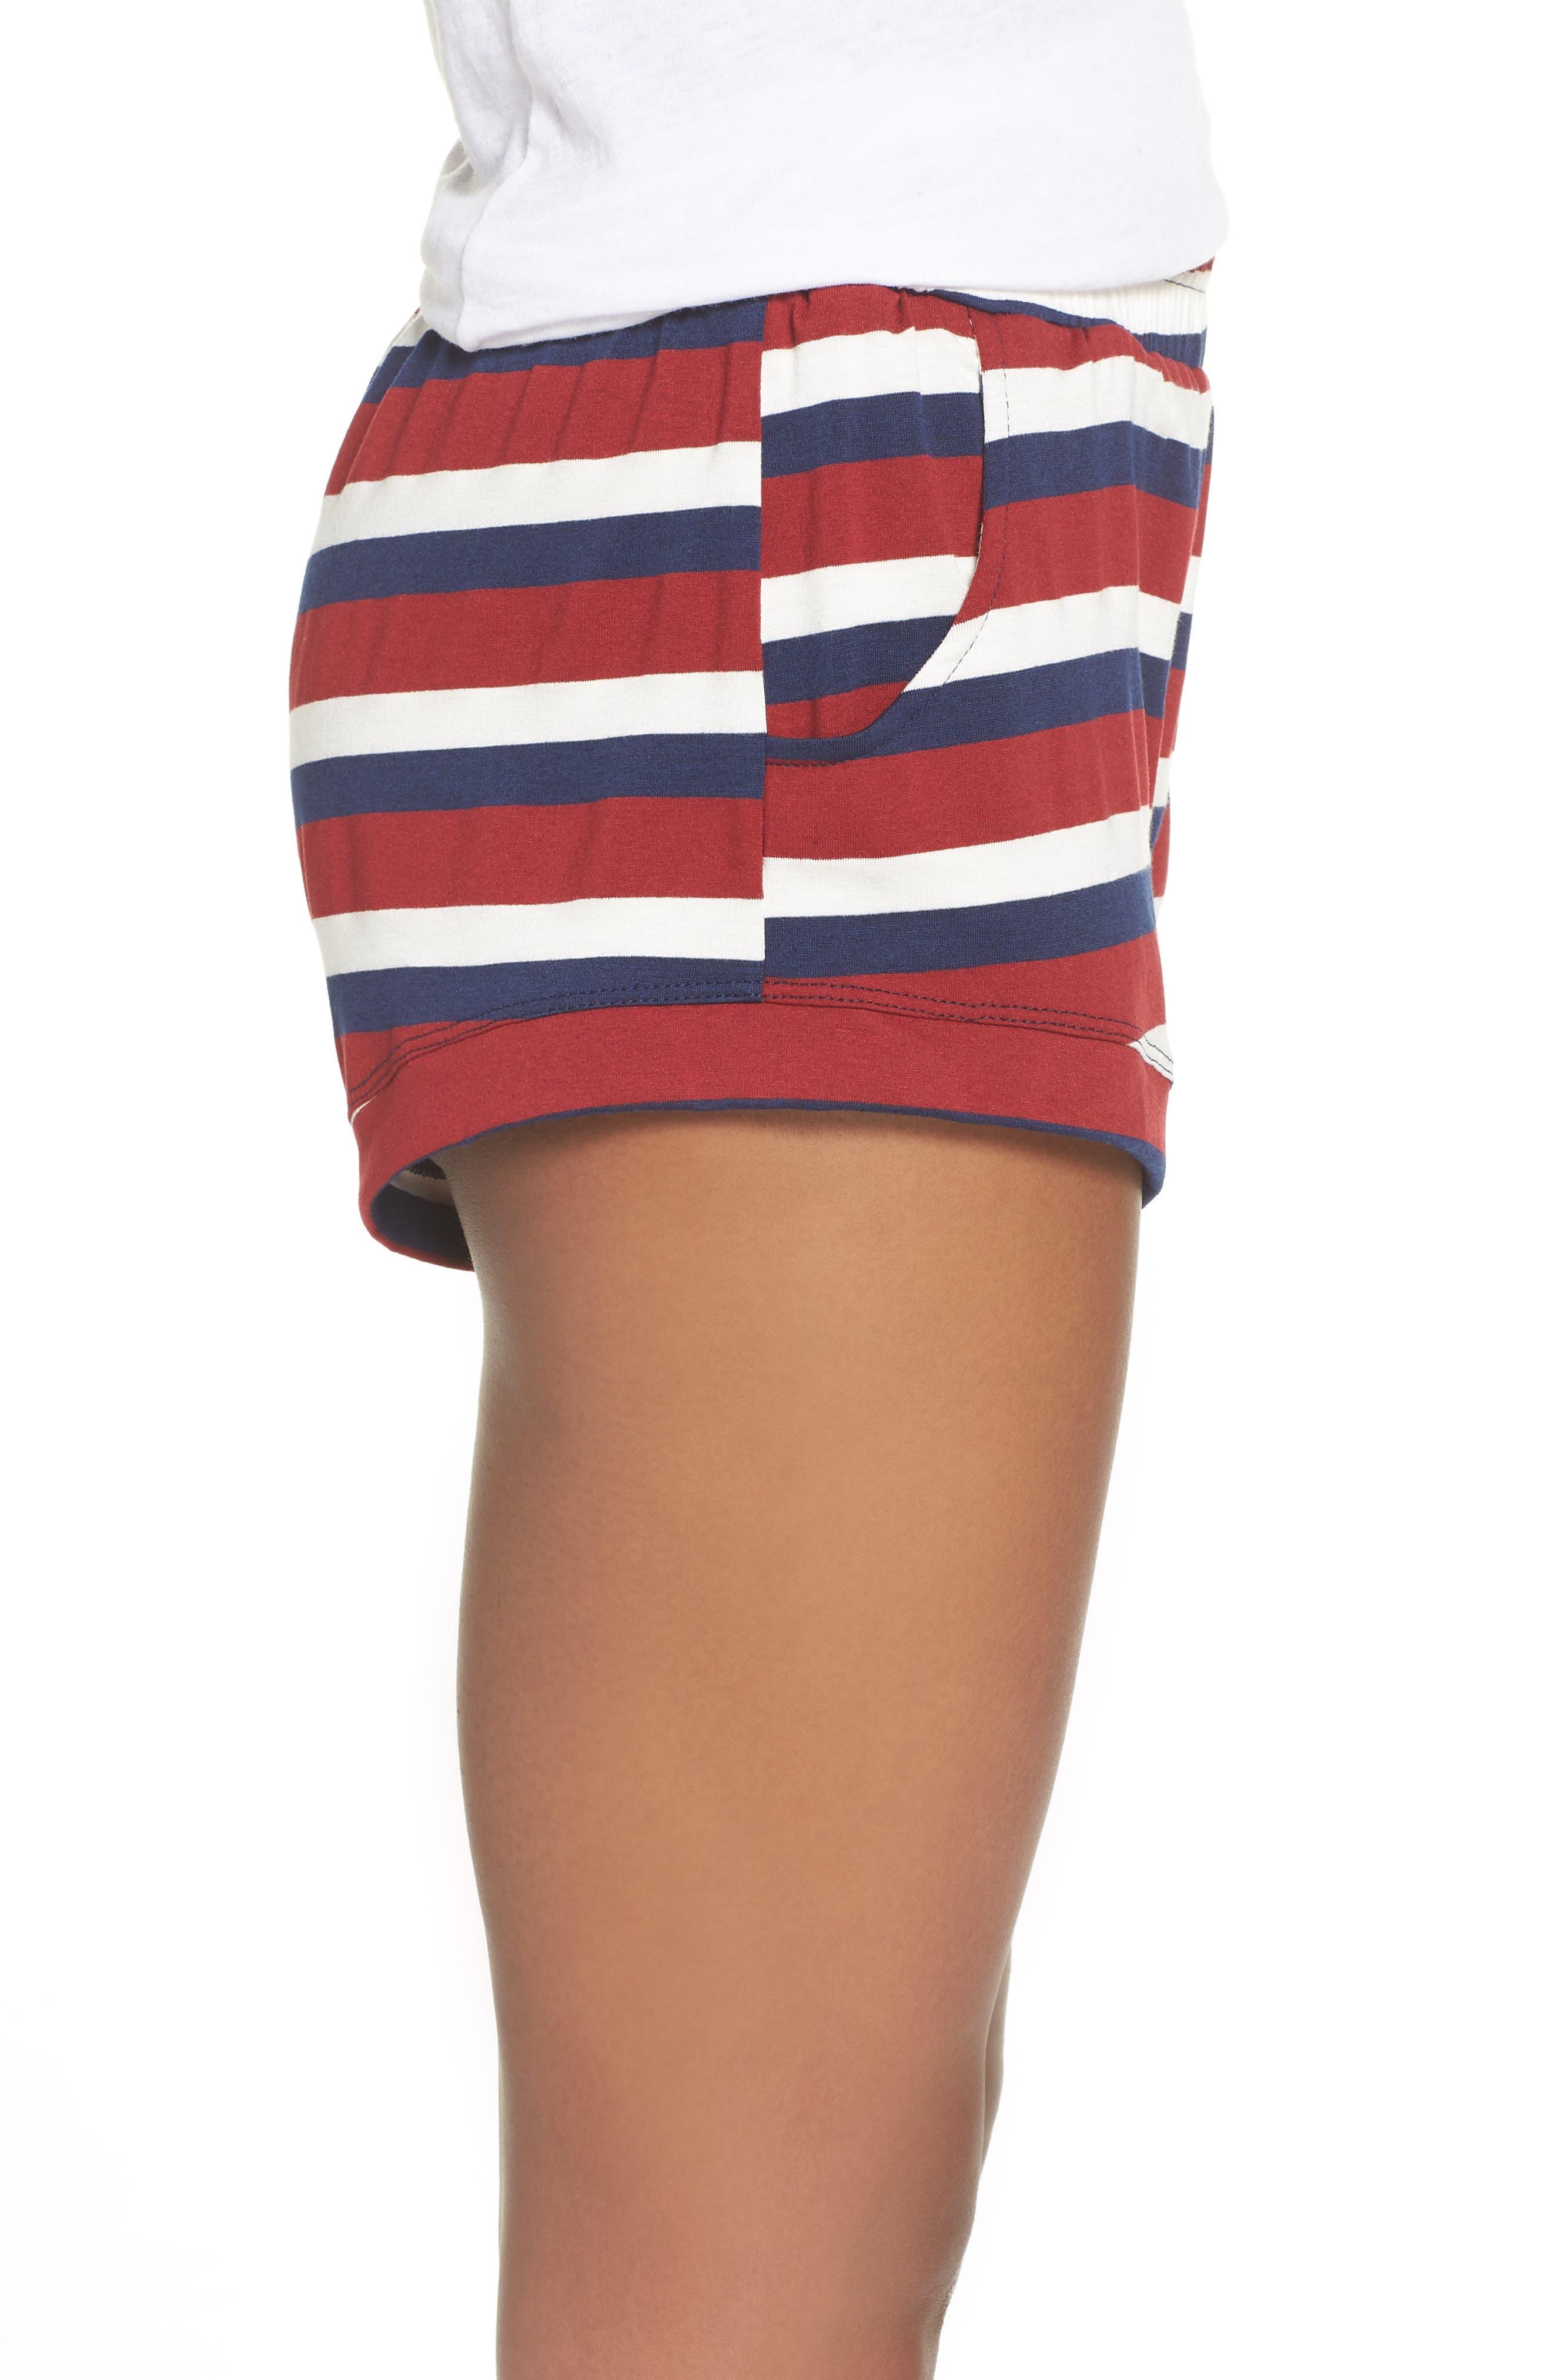 Elody Shorts,                             Alternate thumbnail 3, color,                             BRICK STRIPE